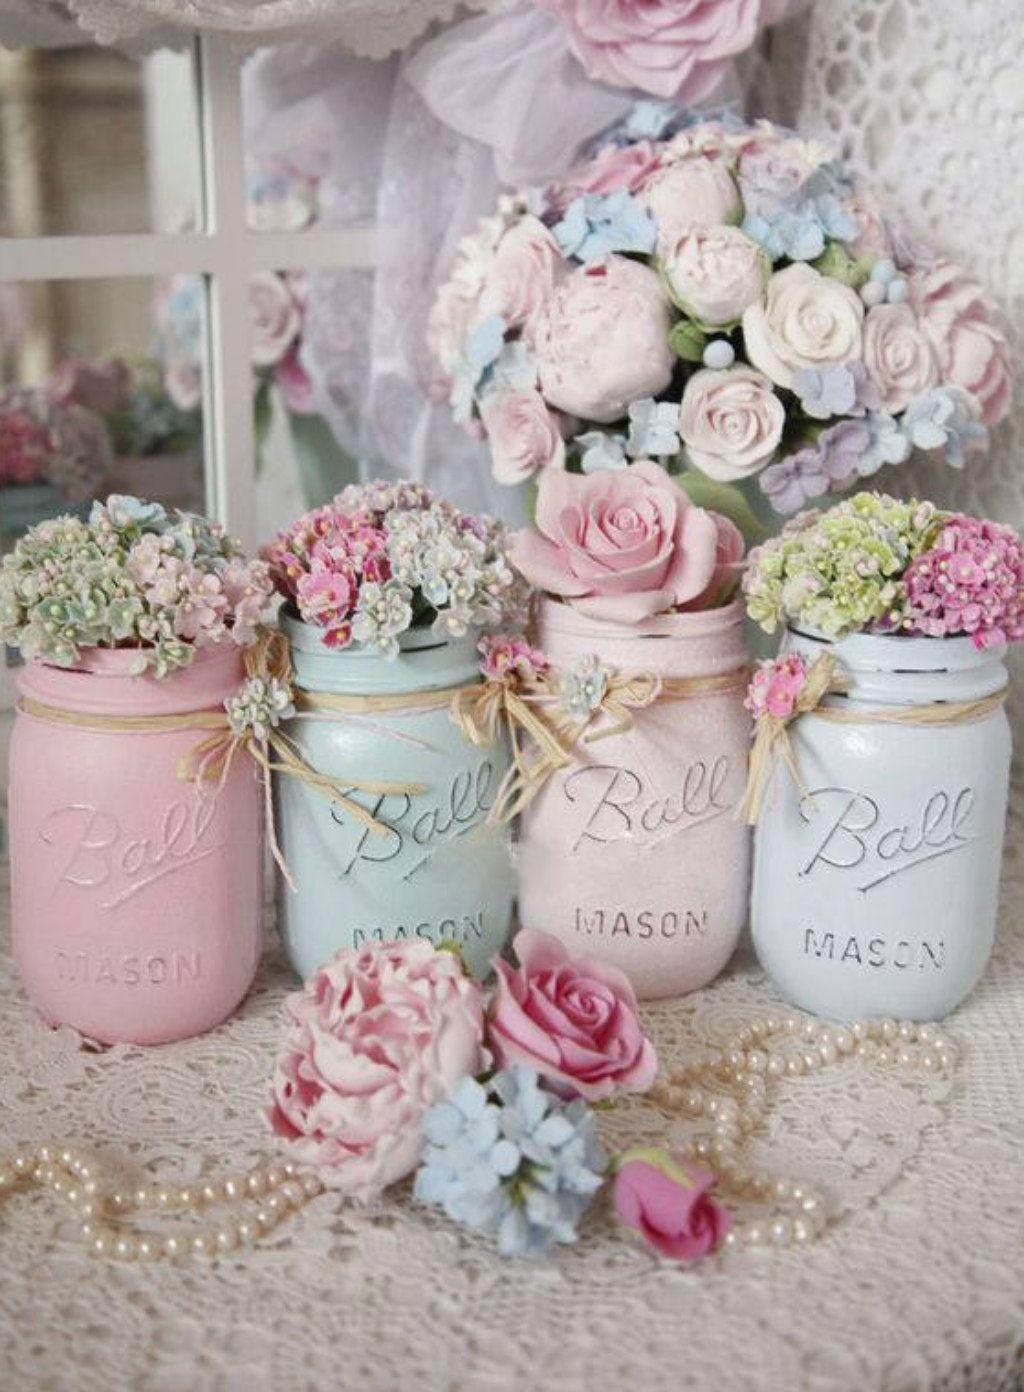 Wedding dress centerpiece  Shabby Chic Painted Mason Jar Centerpiece Decor Vase Wedding Bridal